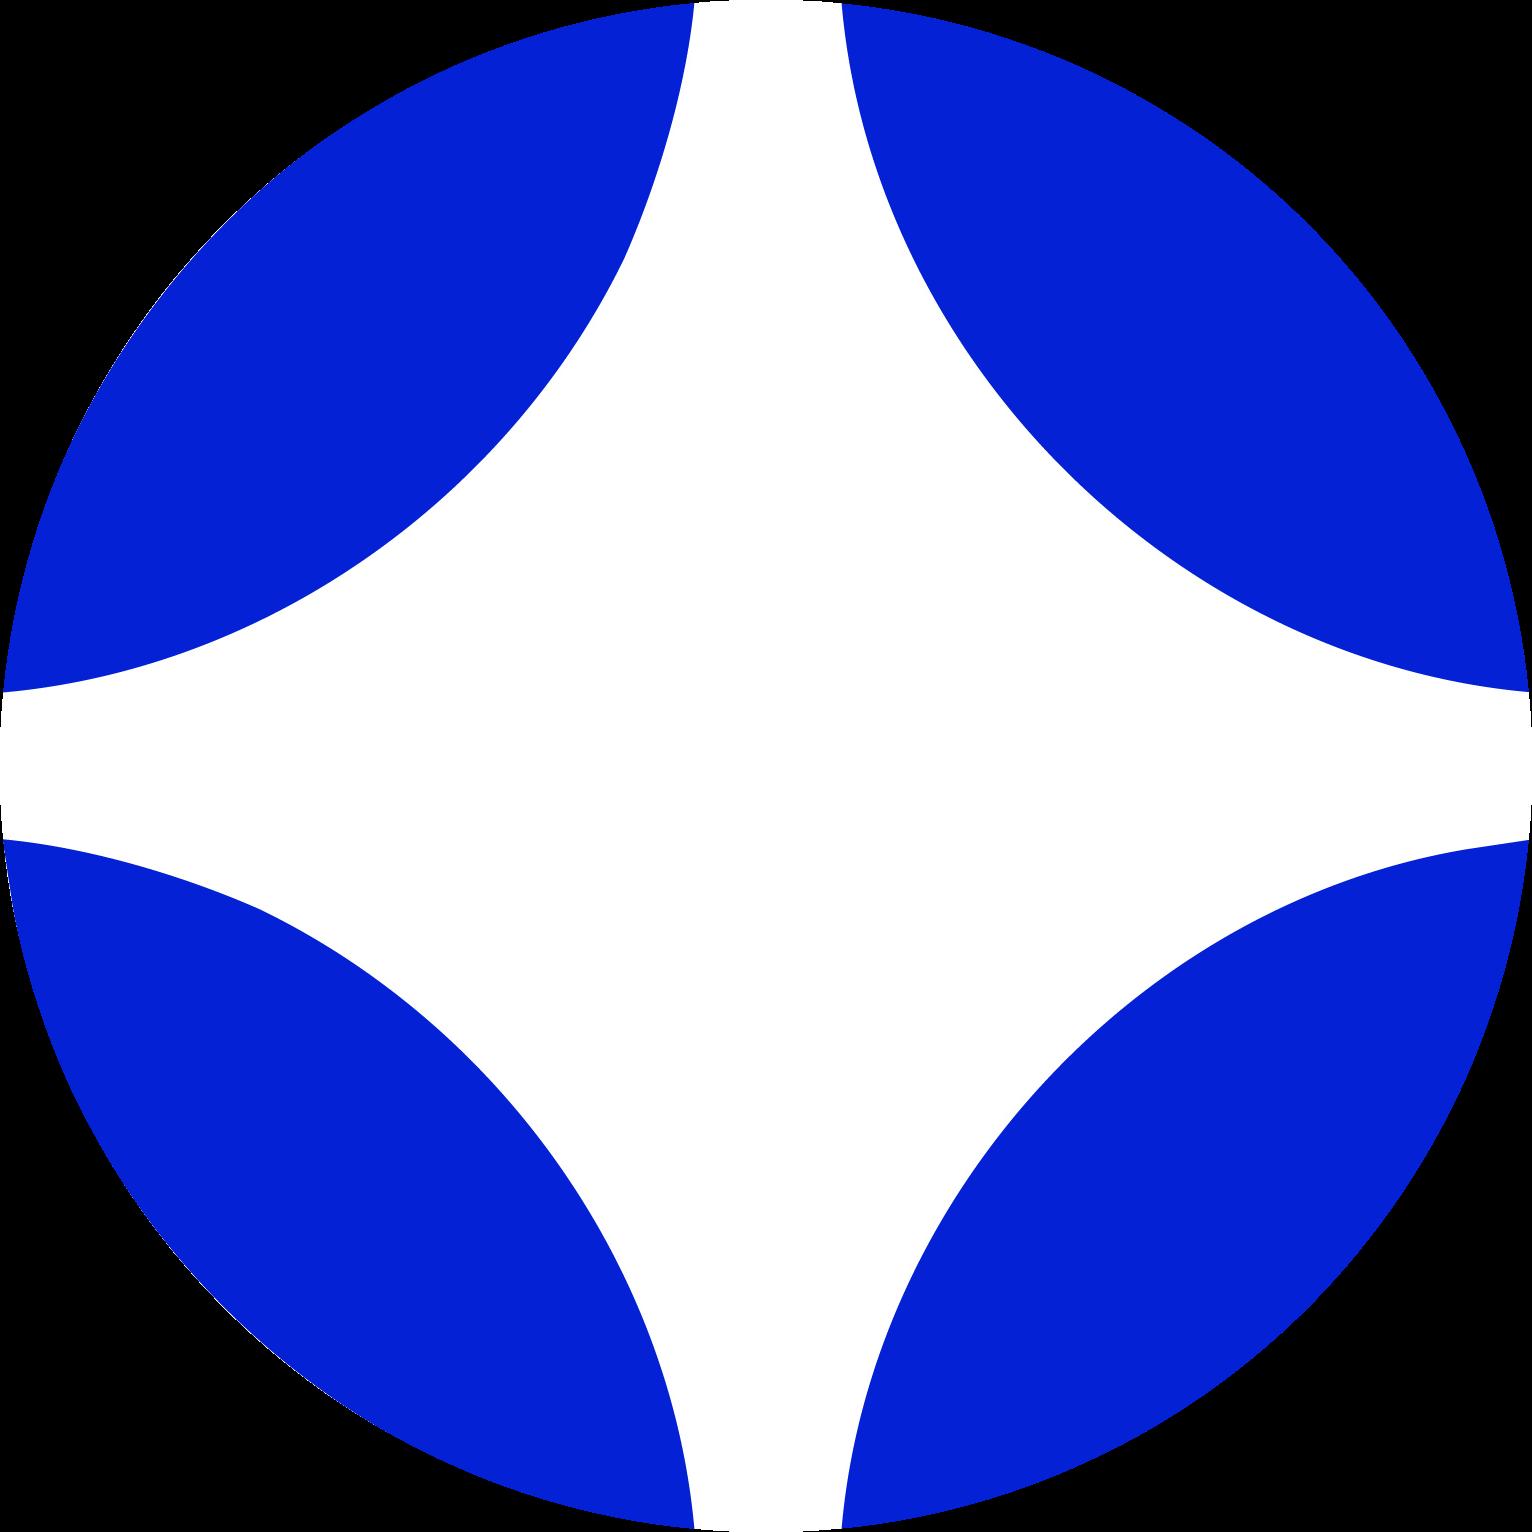 circle-cropped (10)-Jun-01-2021-07-29-37-44-AM